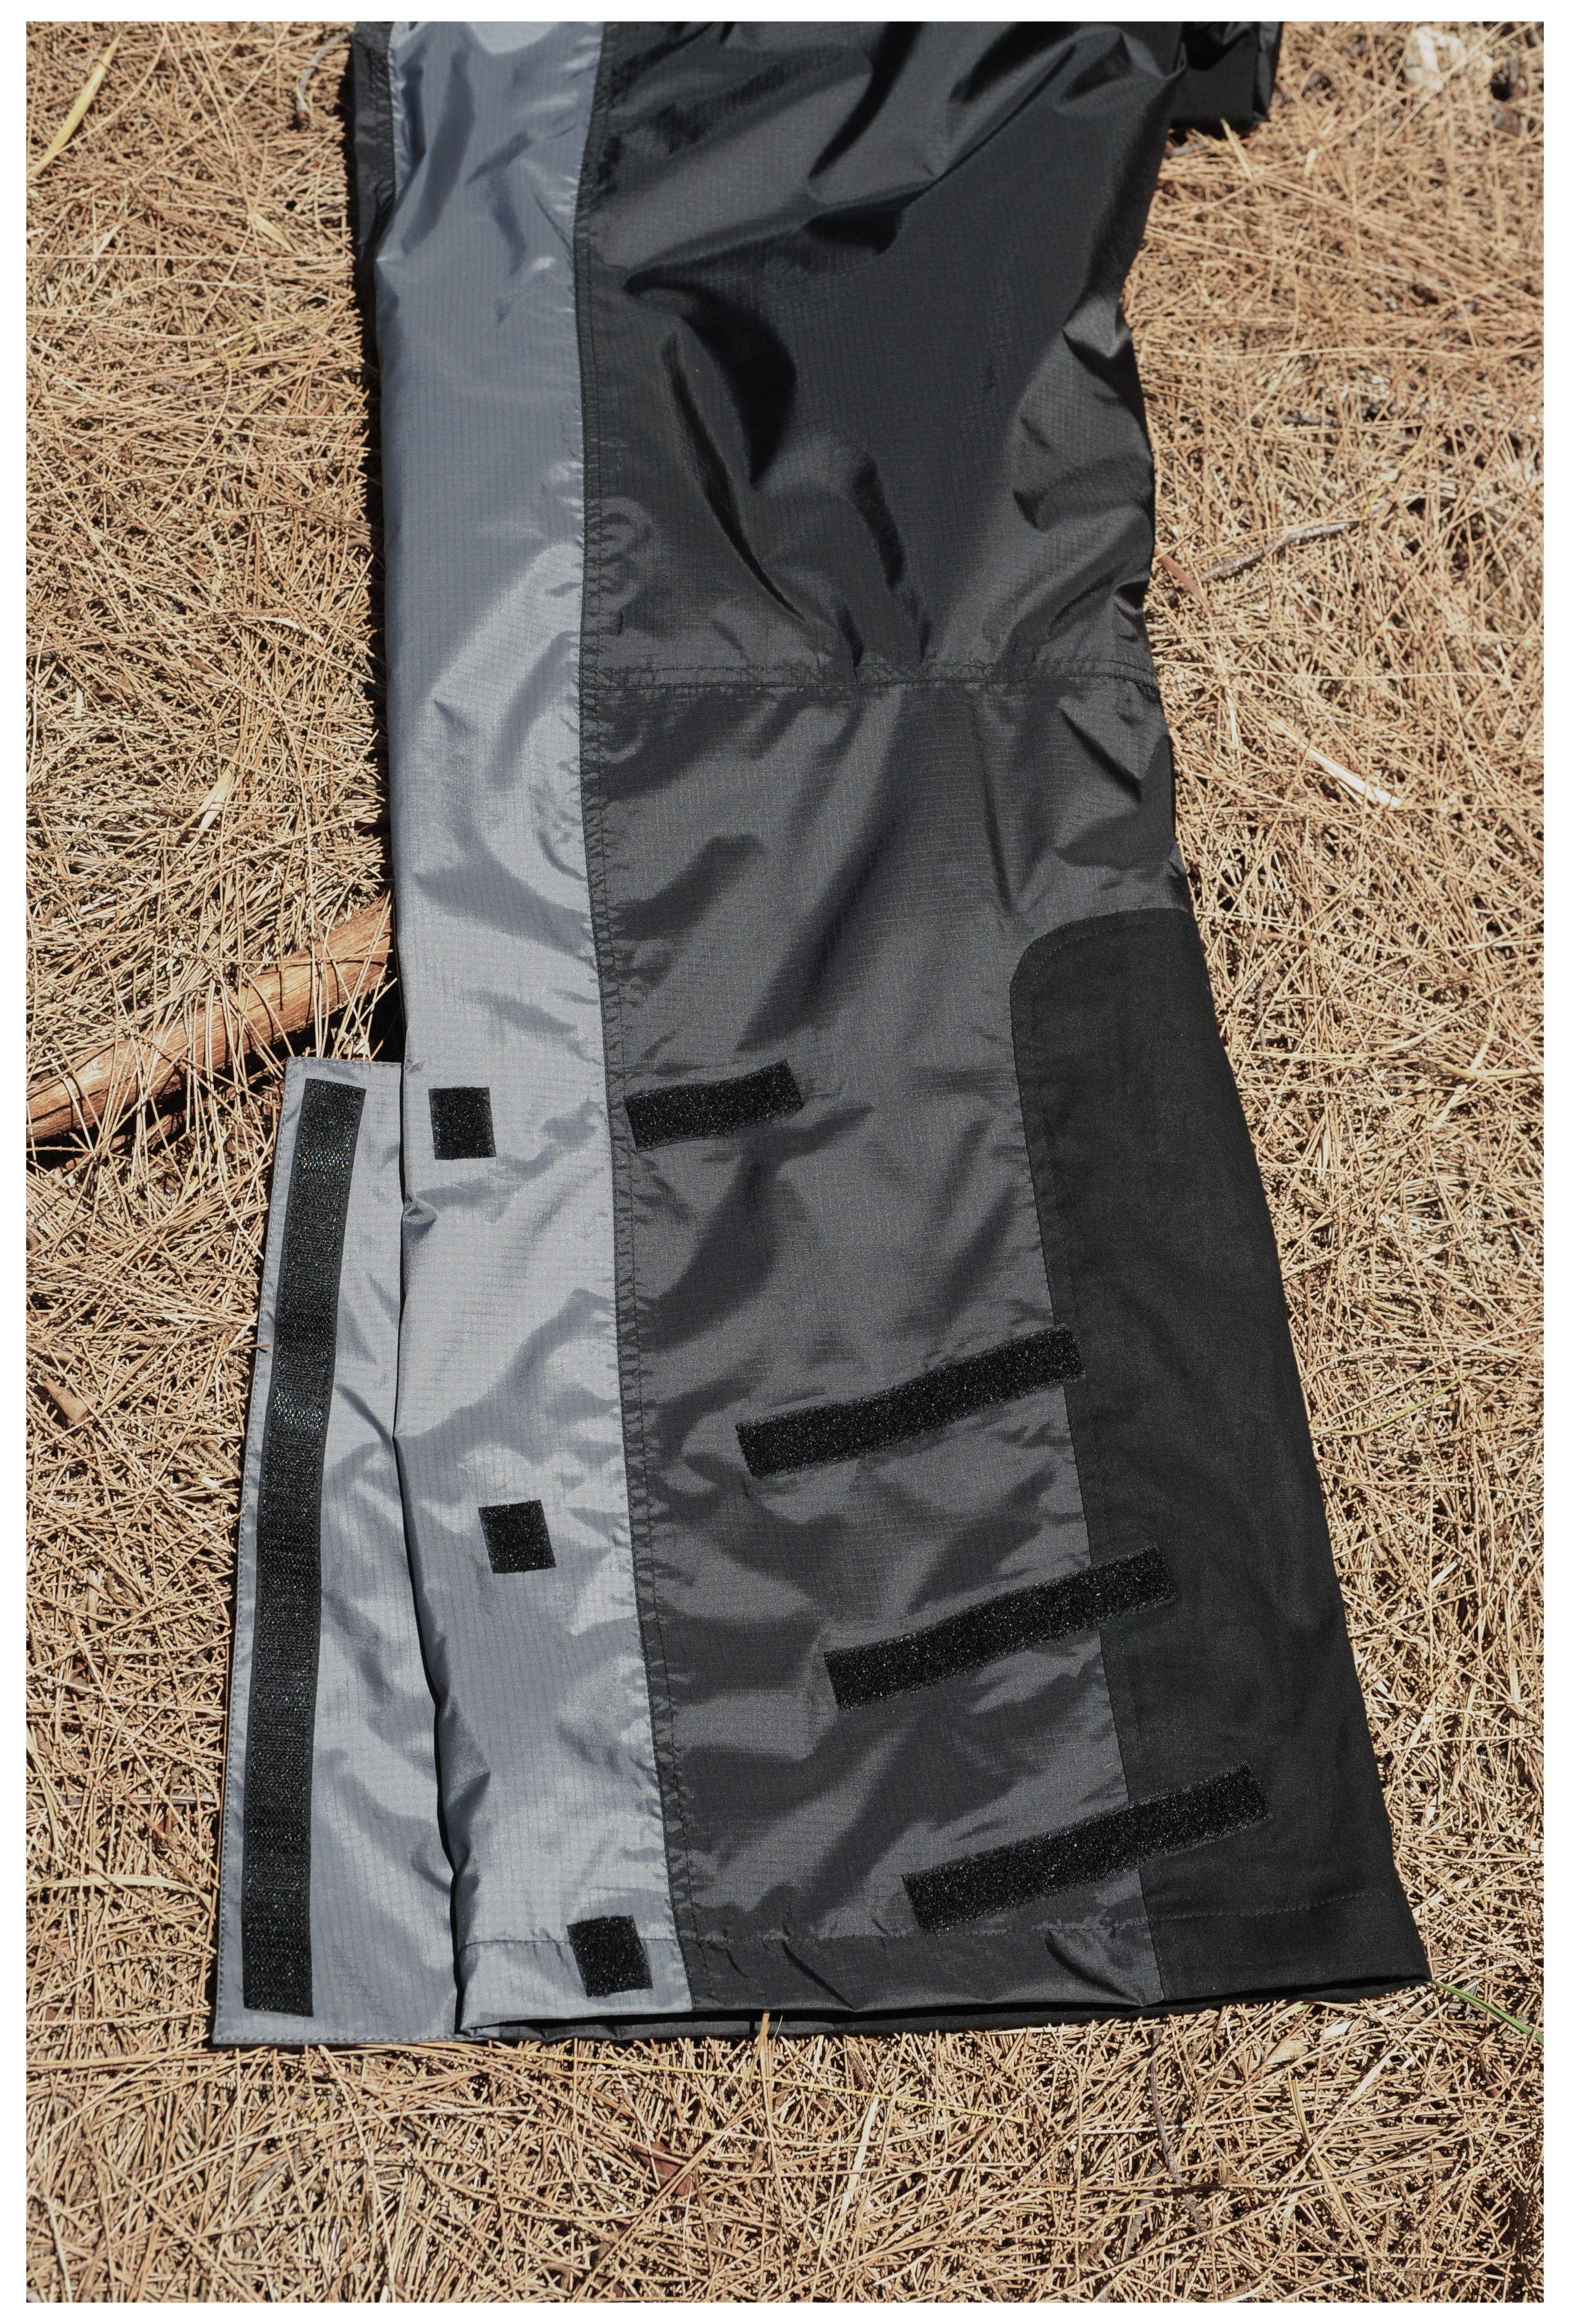 Pewter, X-Small//Small Olympia Unisex-Adult Horizon Rain Pant